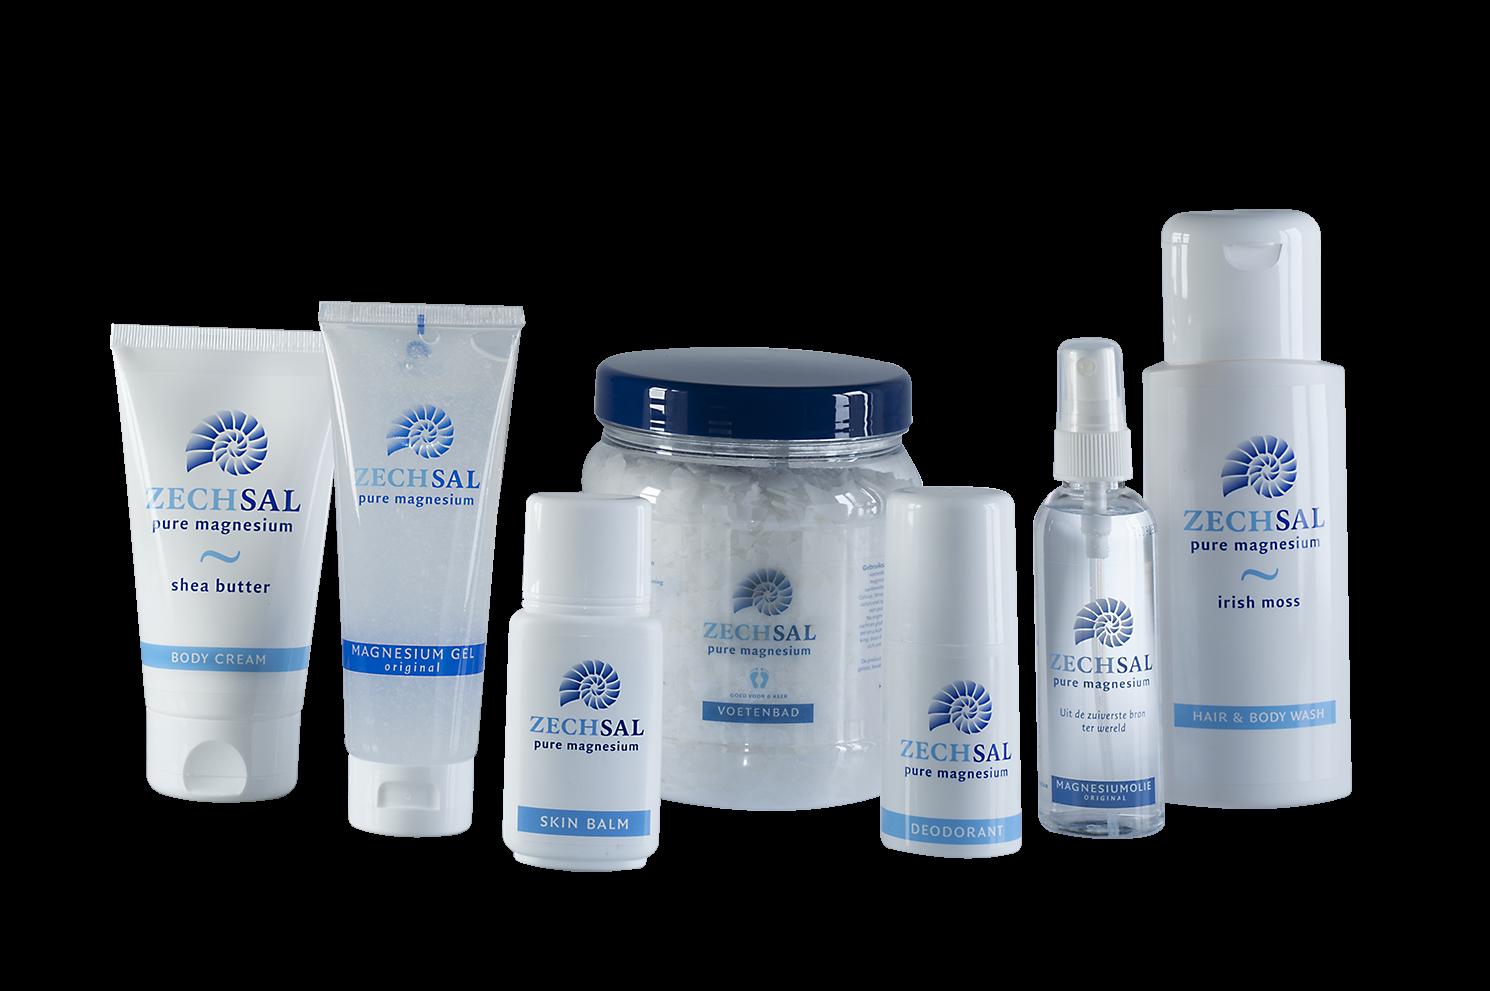 Startpakket (7 Zechsal producten)